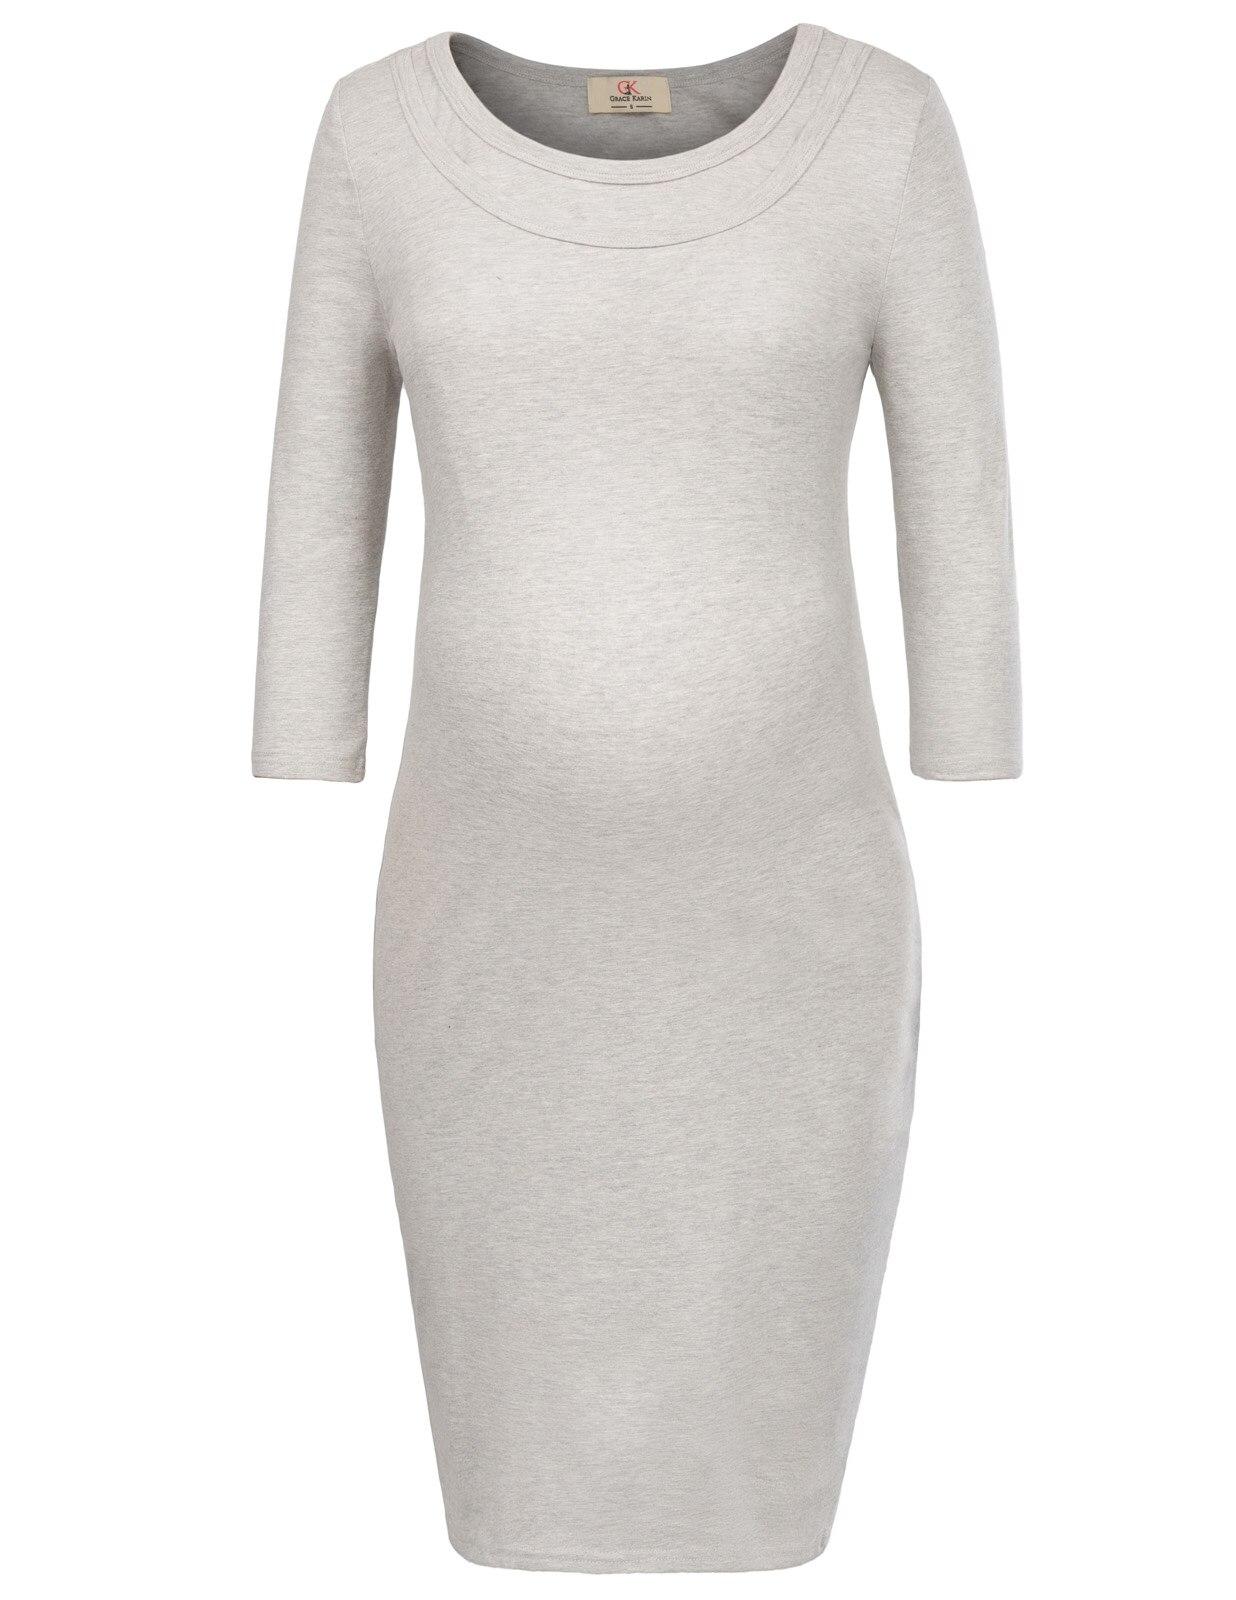 sexy Pregnant Women pencil dress half Sleeve Crew Neck Maternity Nursing Breastfeeding Cotton solid Dress